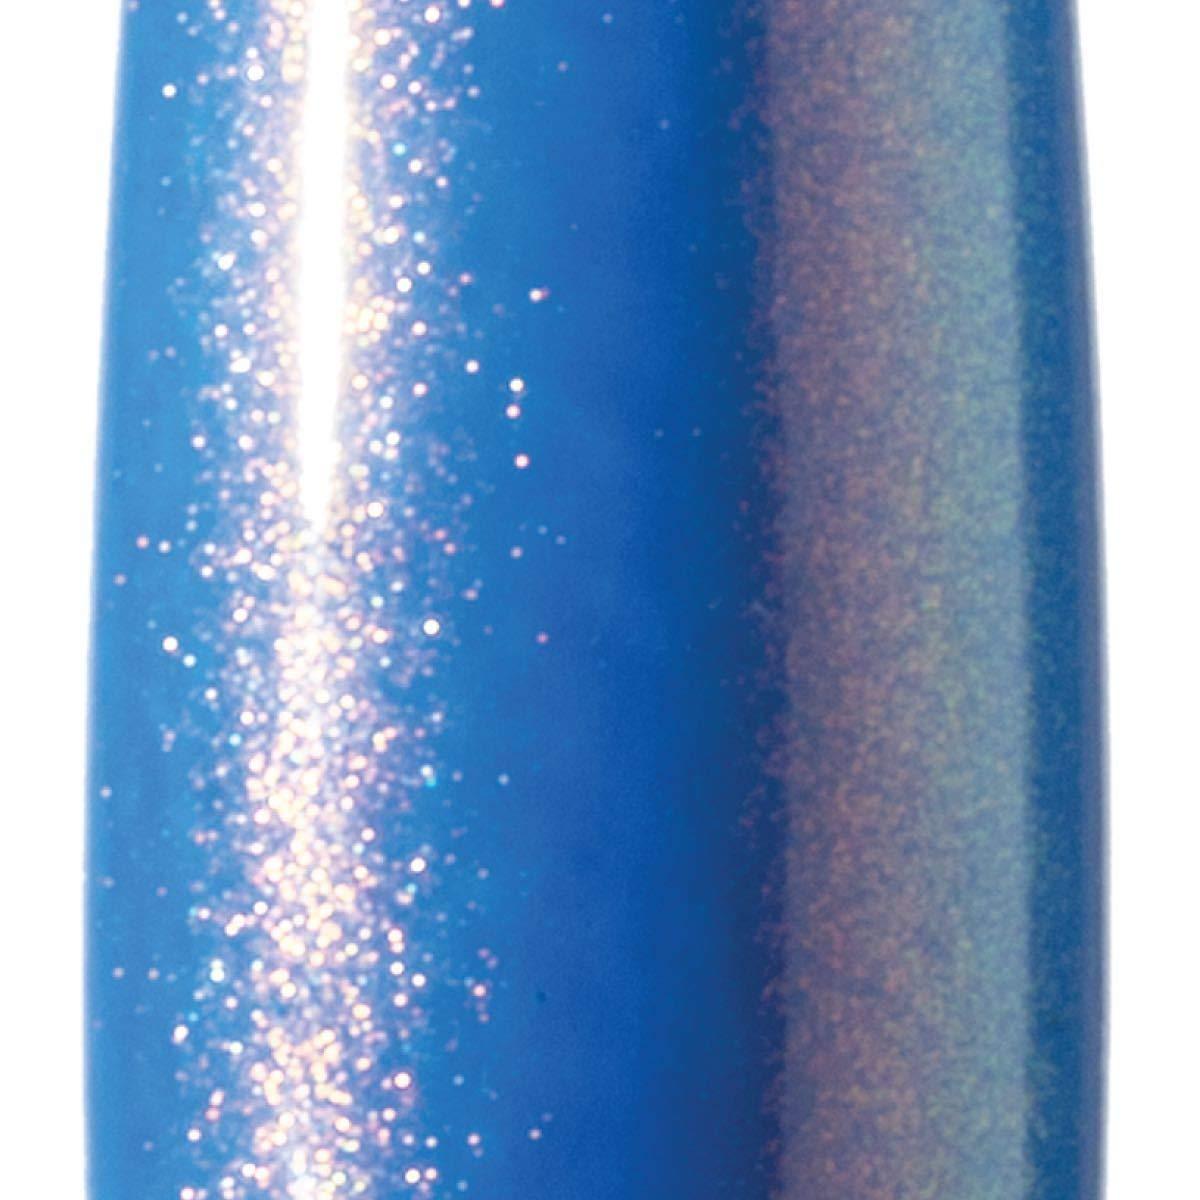 Furls Odyssey Crochet Hook Nickel Plated Tip for Effortless Glide, Blue Ergonomic Handle E - 3.5mm